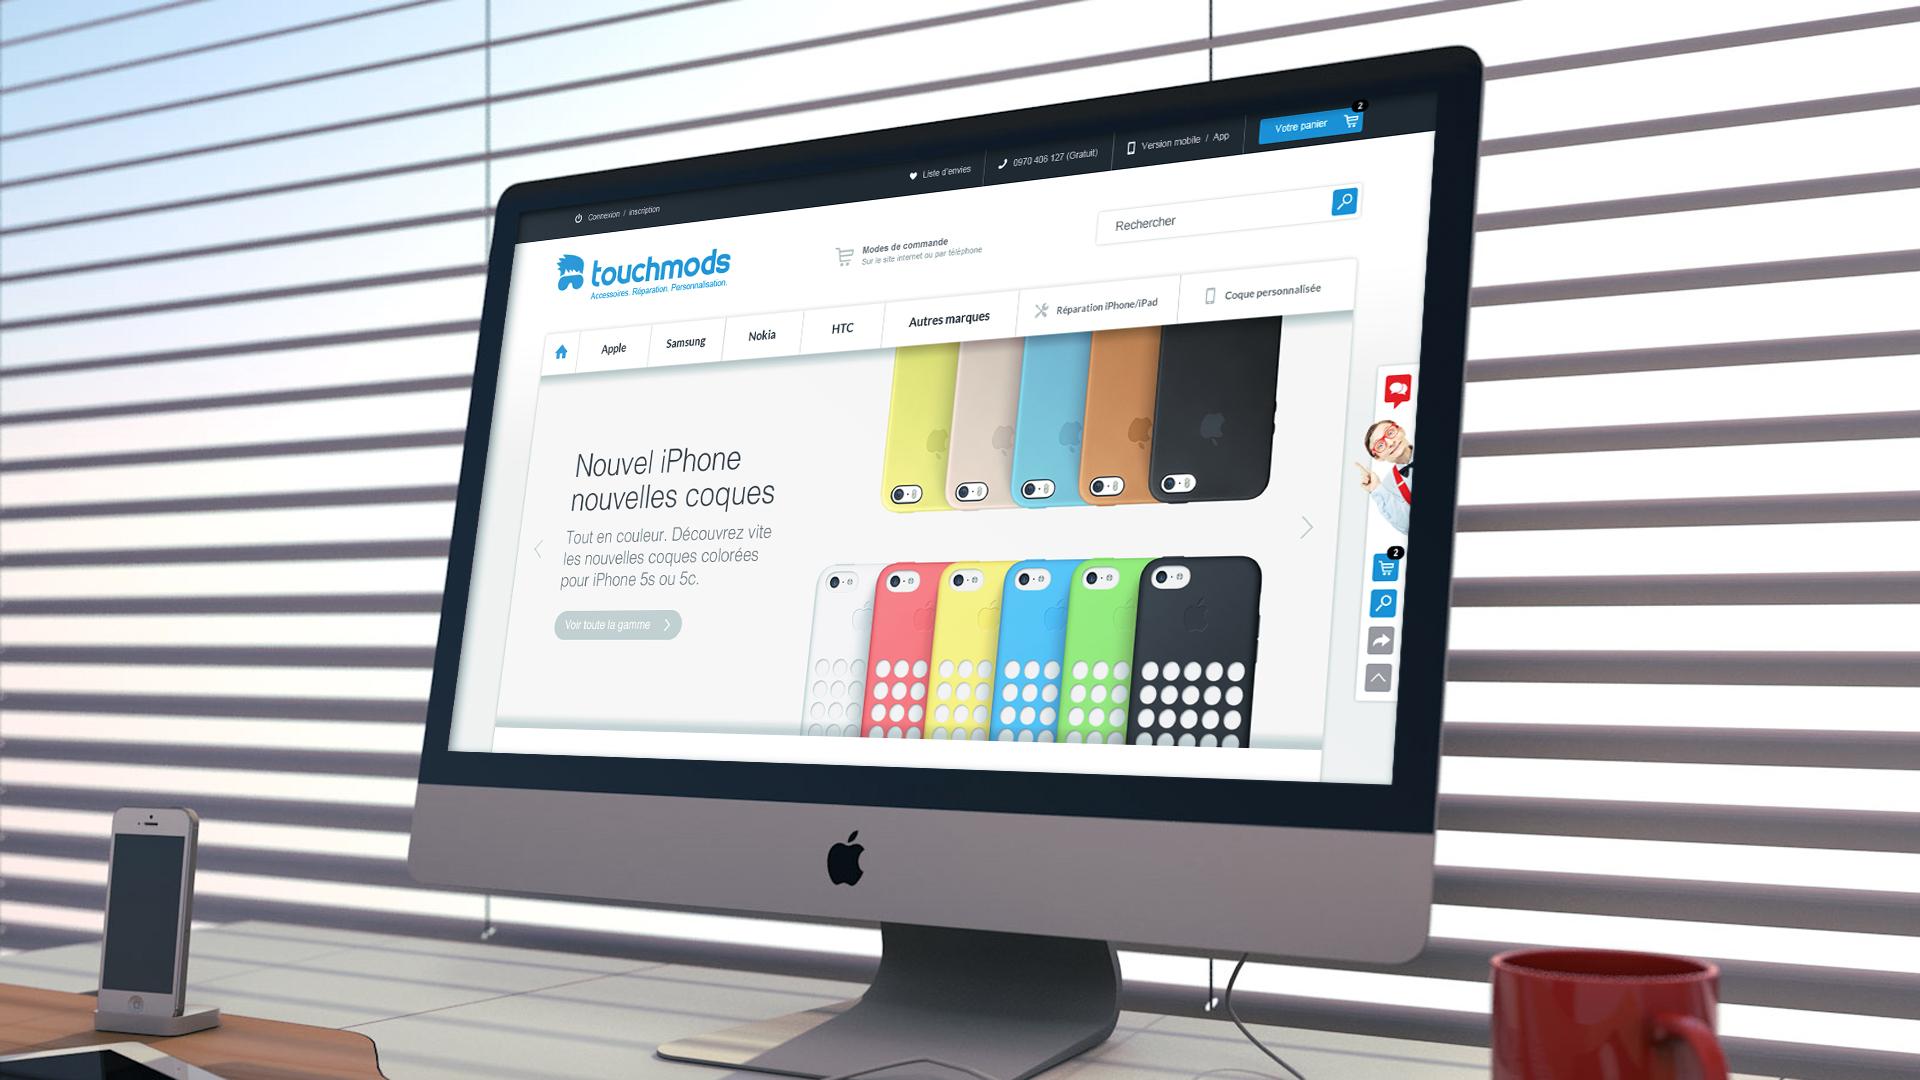 touchmods-creation-design-site-web-ecommerce-magento-caconcept-alexis-cretin-graphiste-montpellier